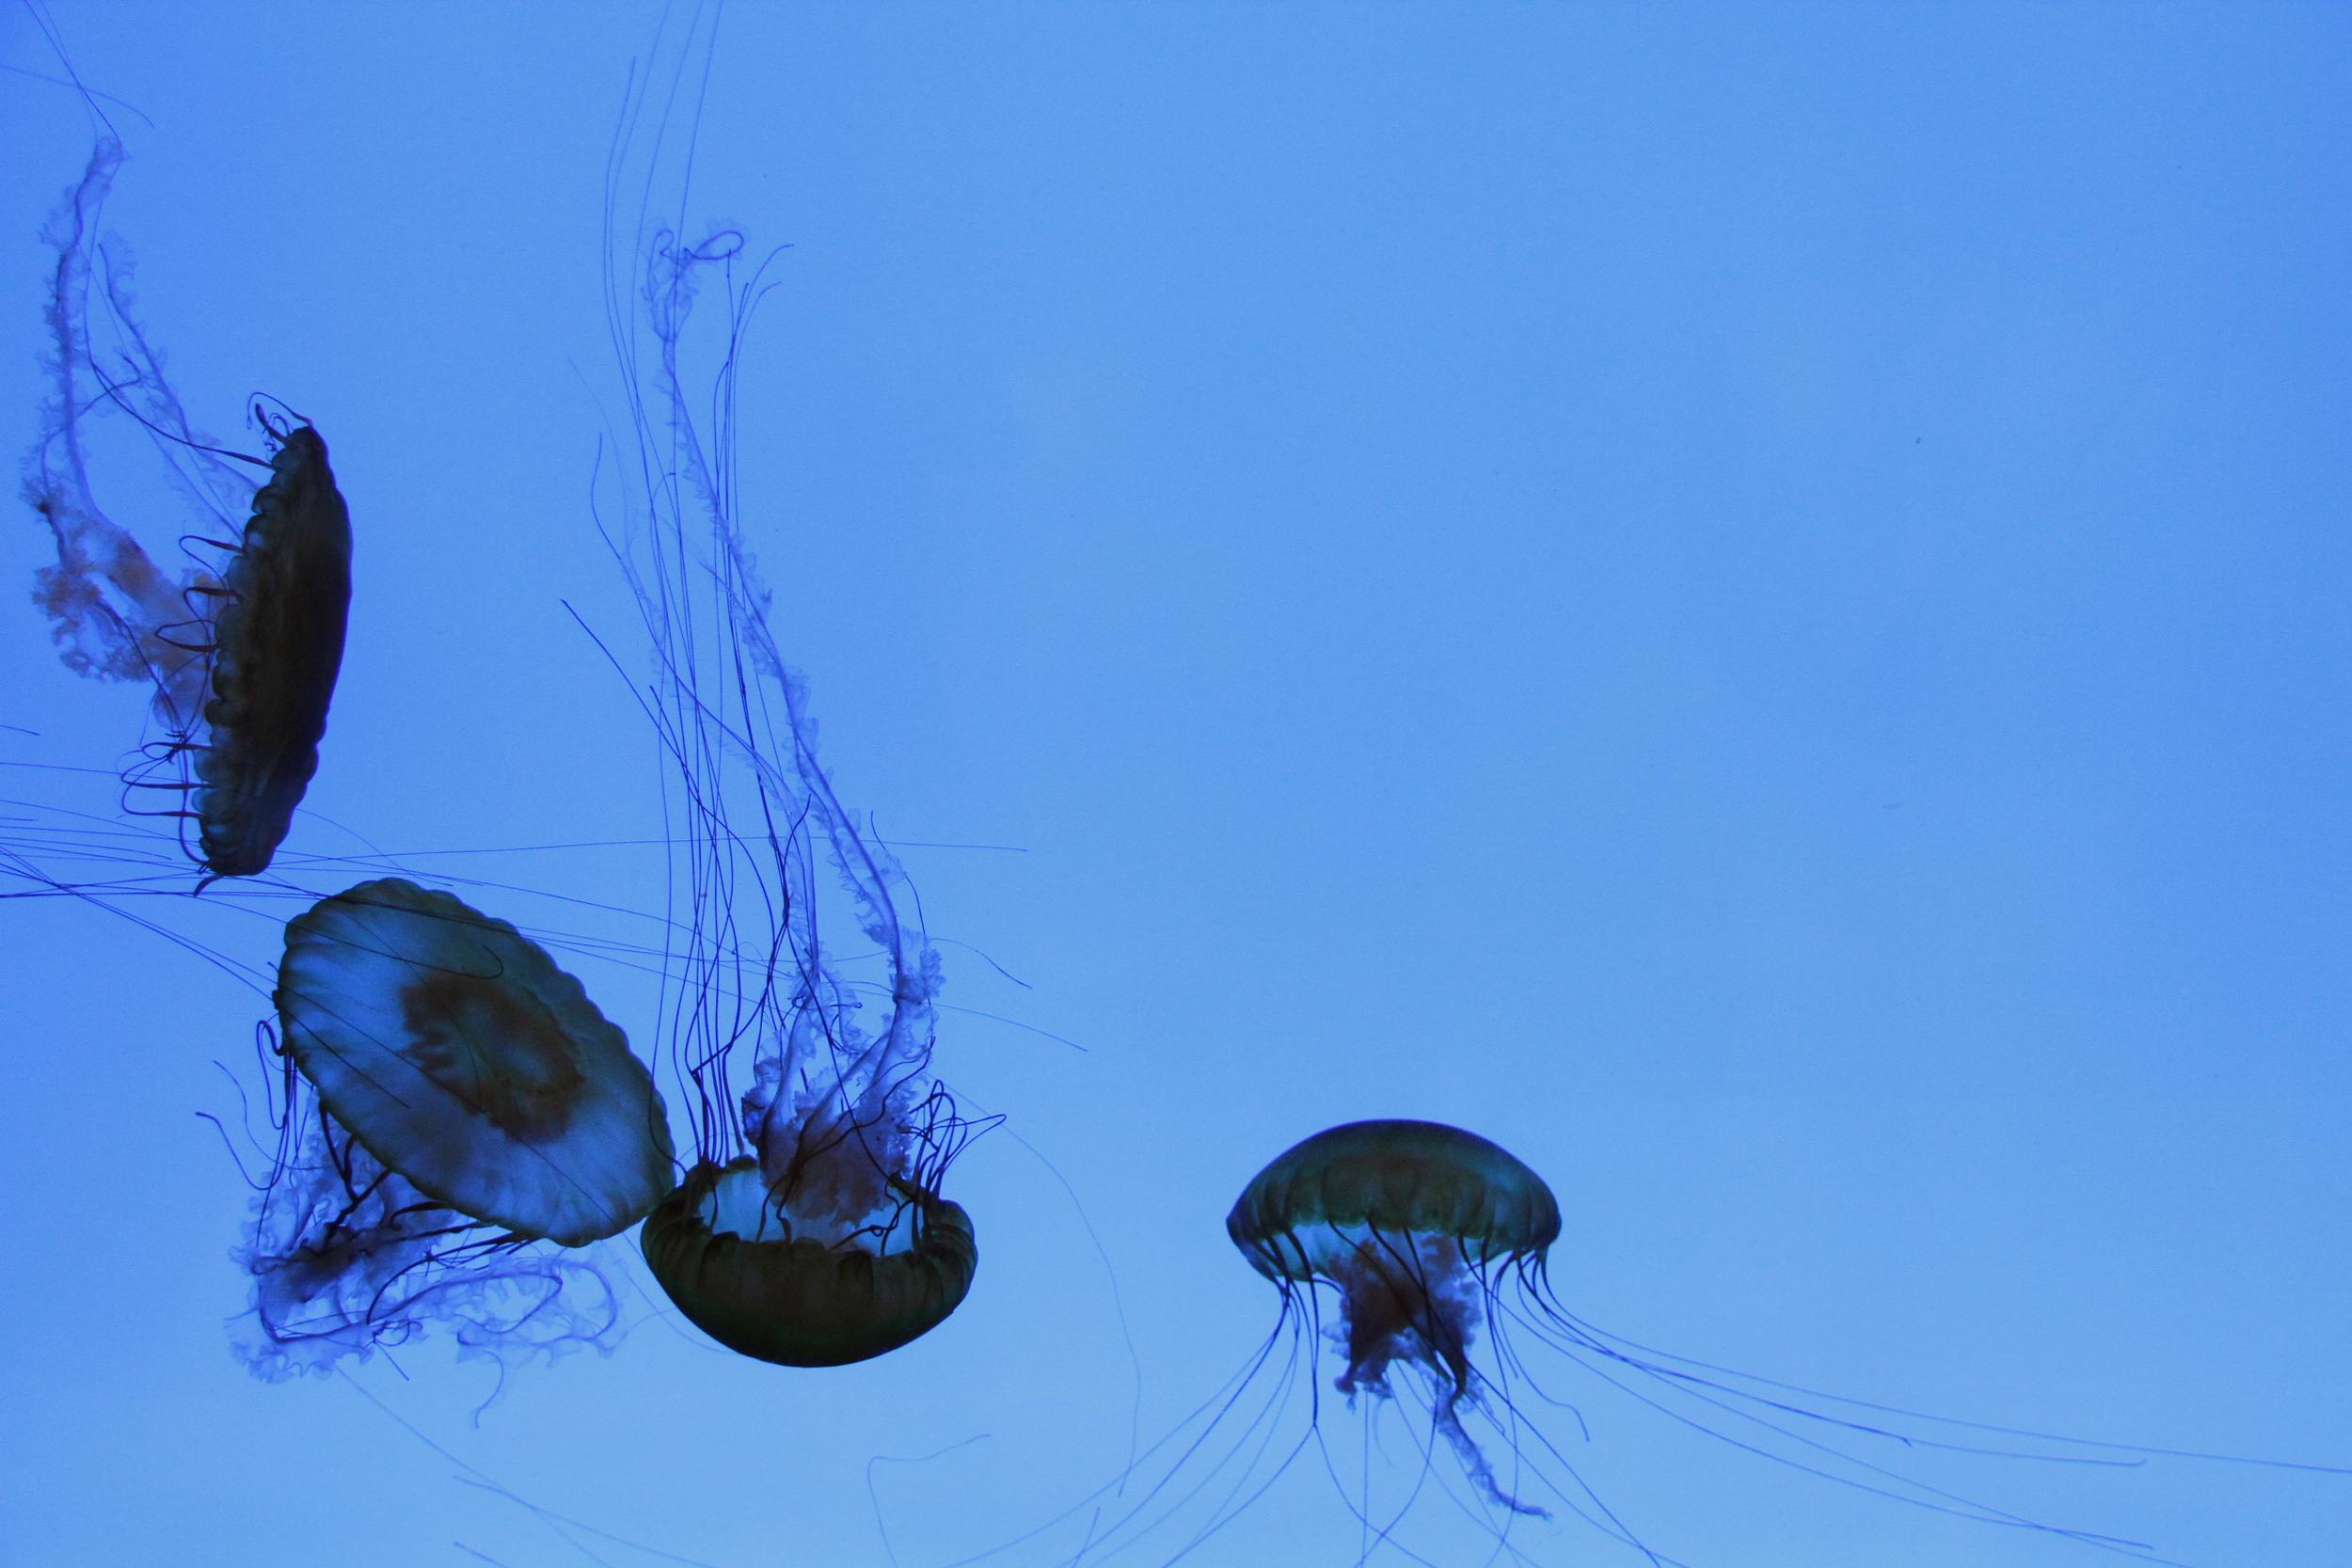 JellyfishBoston.JPG